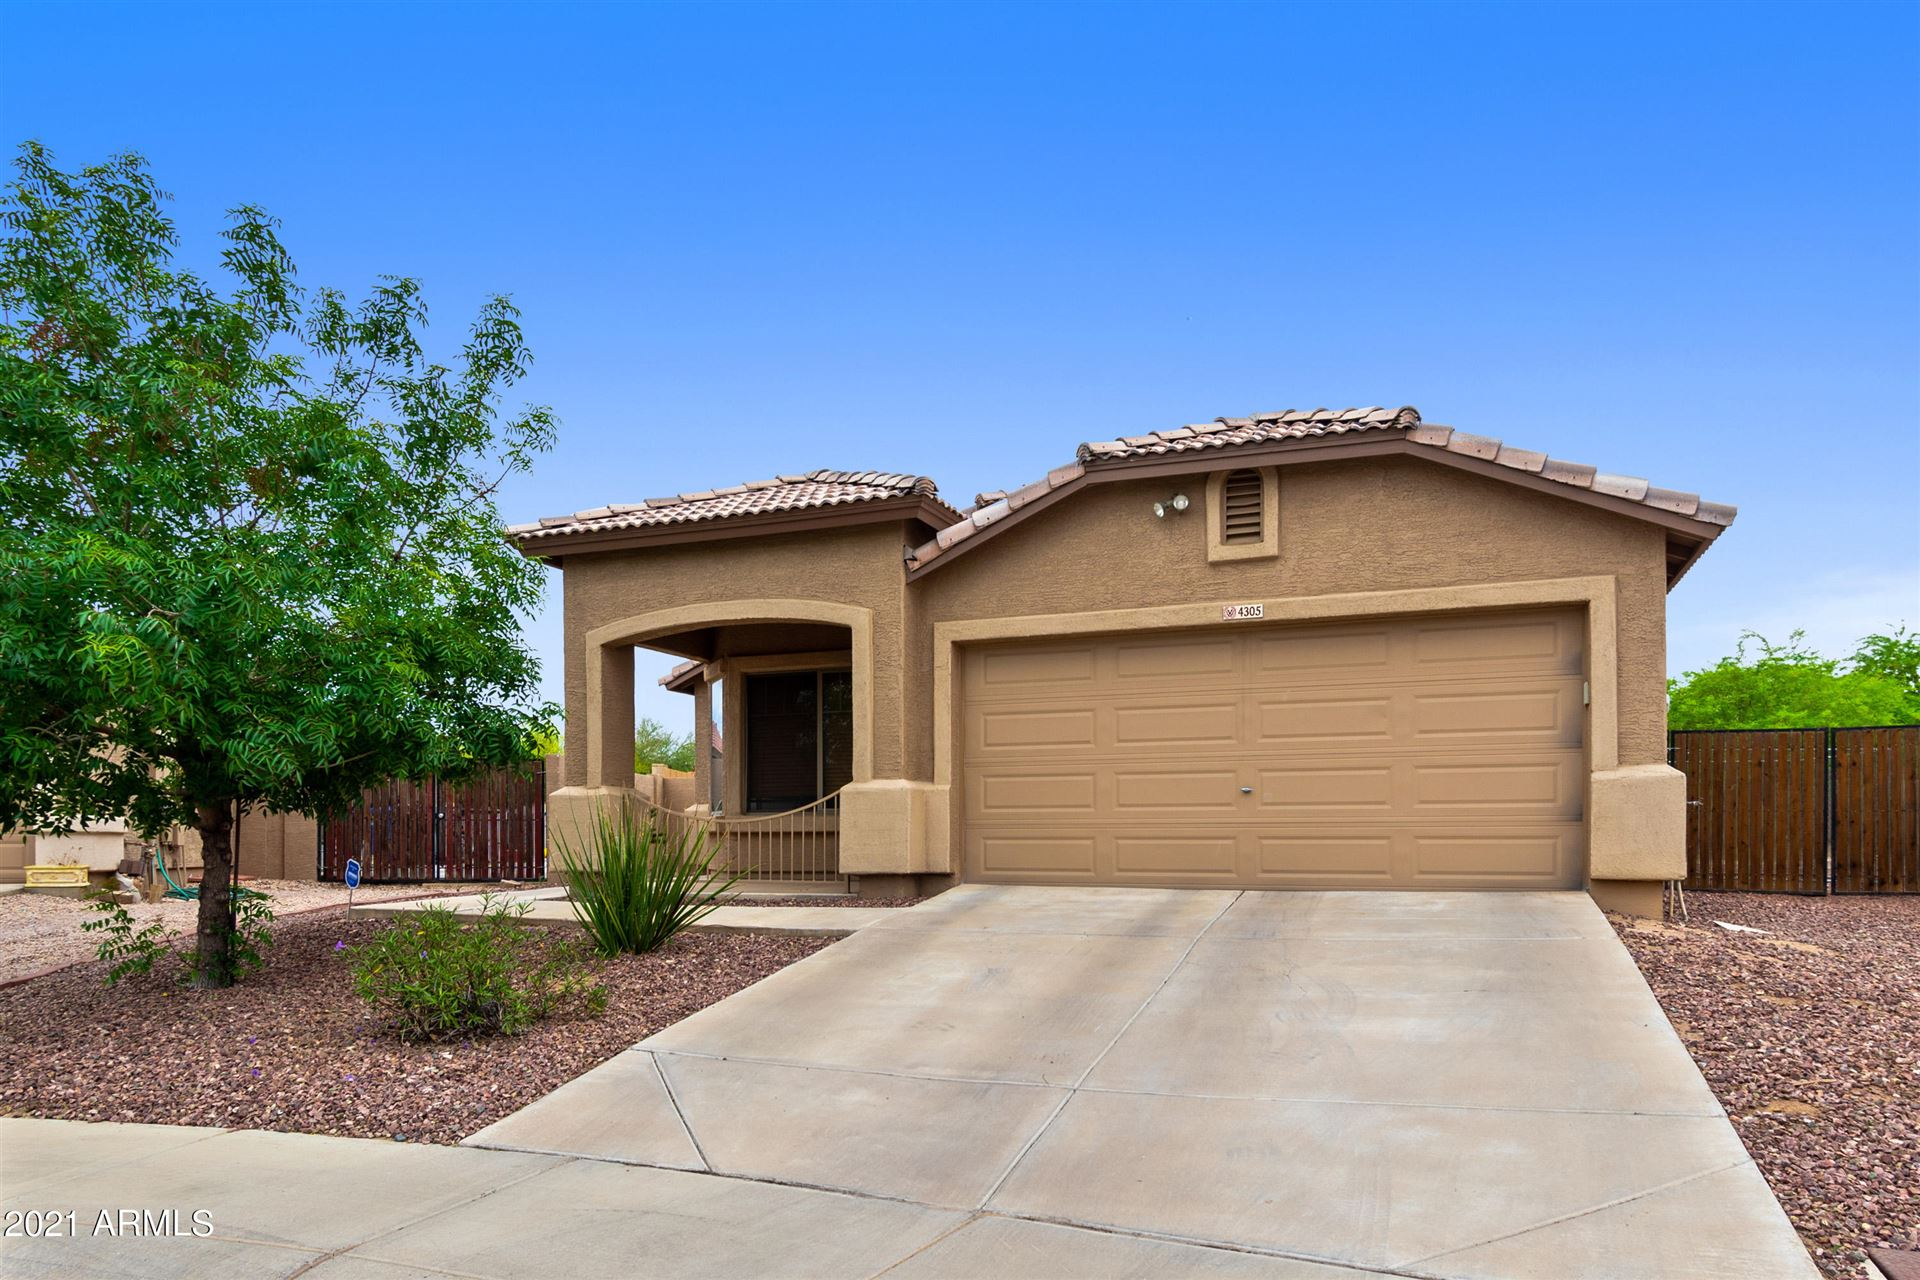 Photo of 4305 W FREMONT Road, Laveen, AZ 85339 (MLS # 6231807)